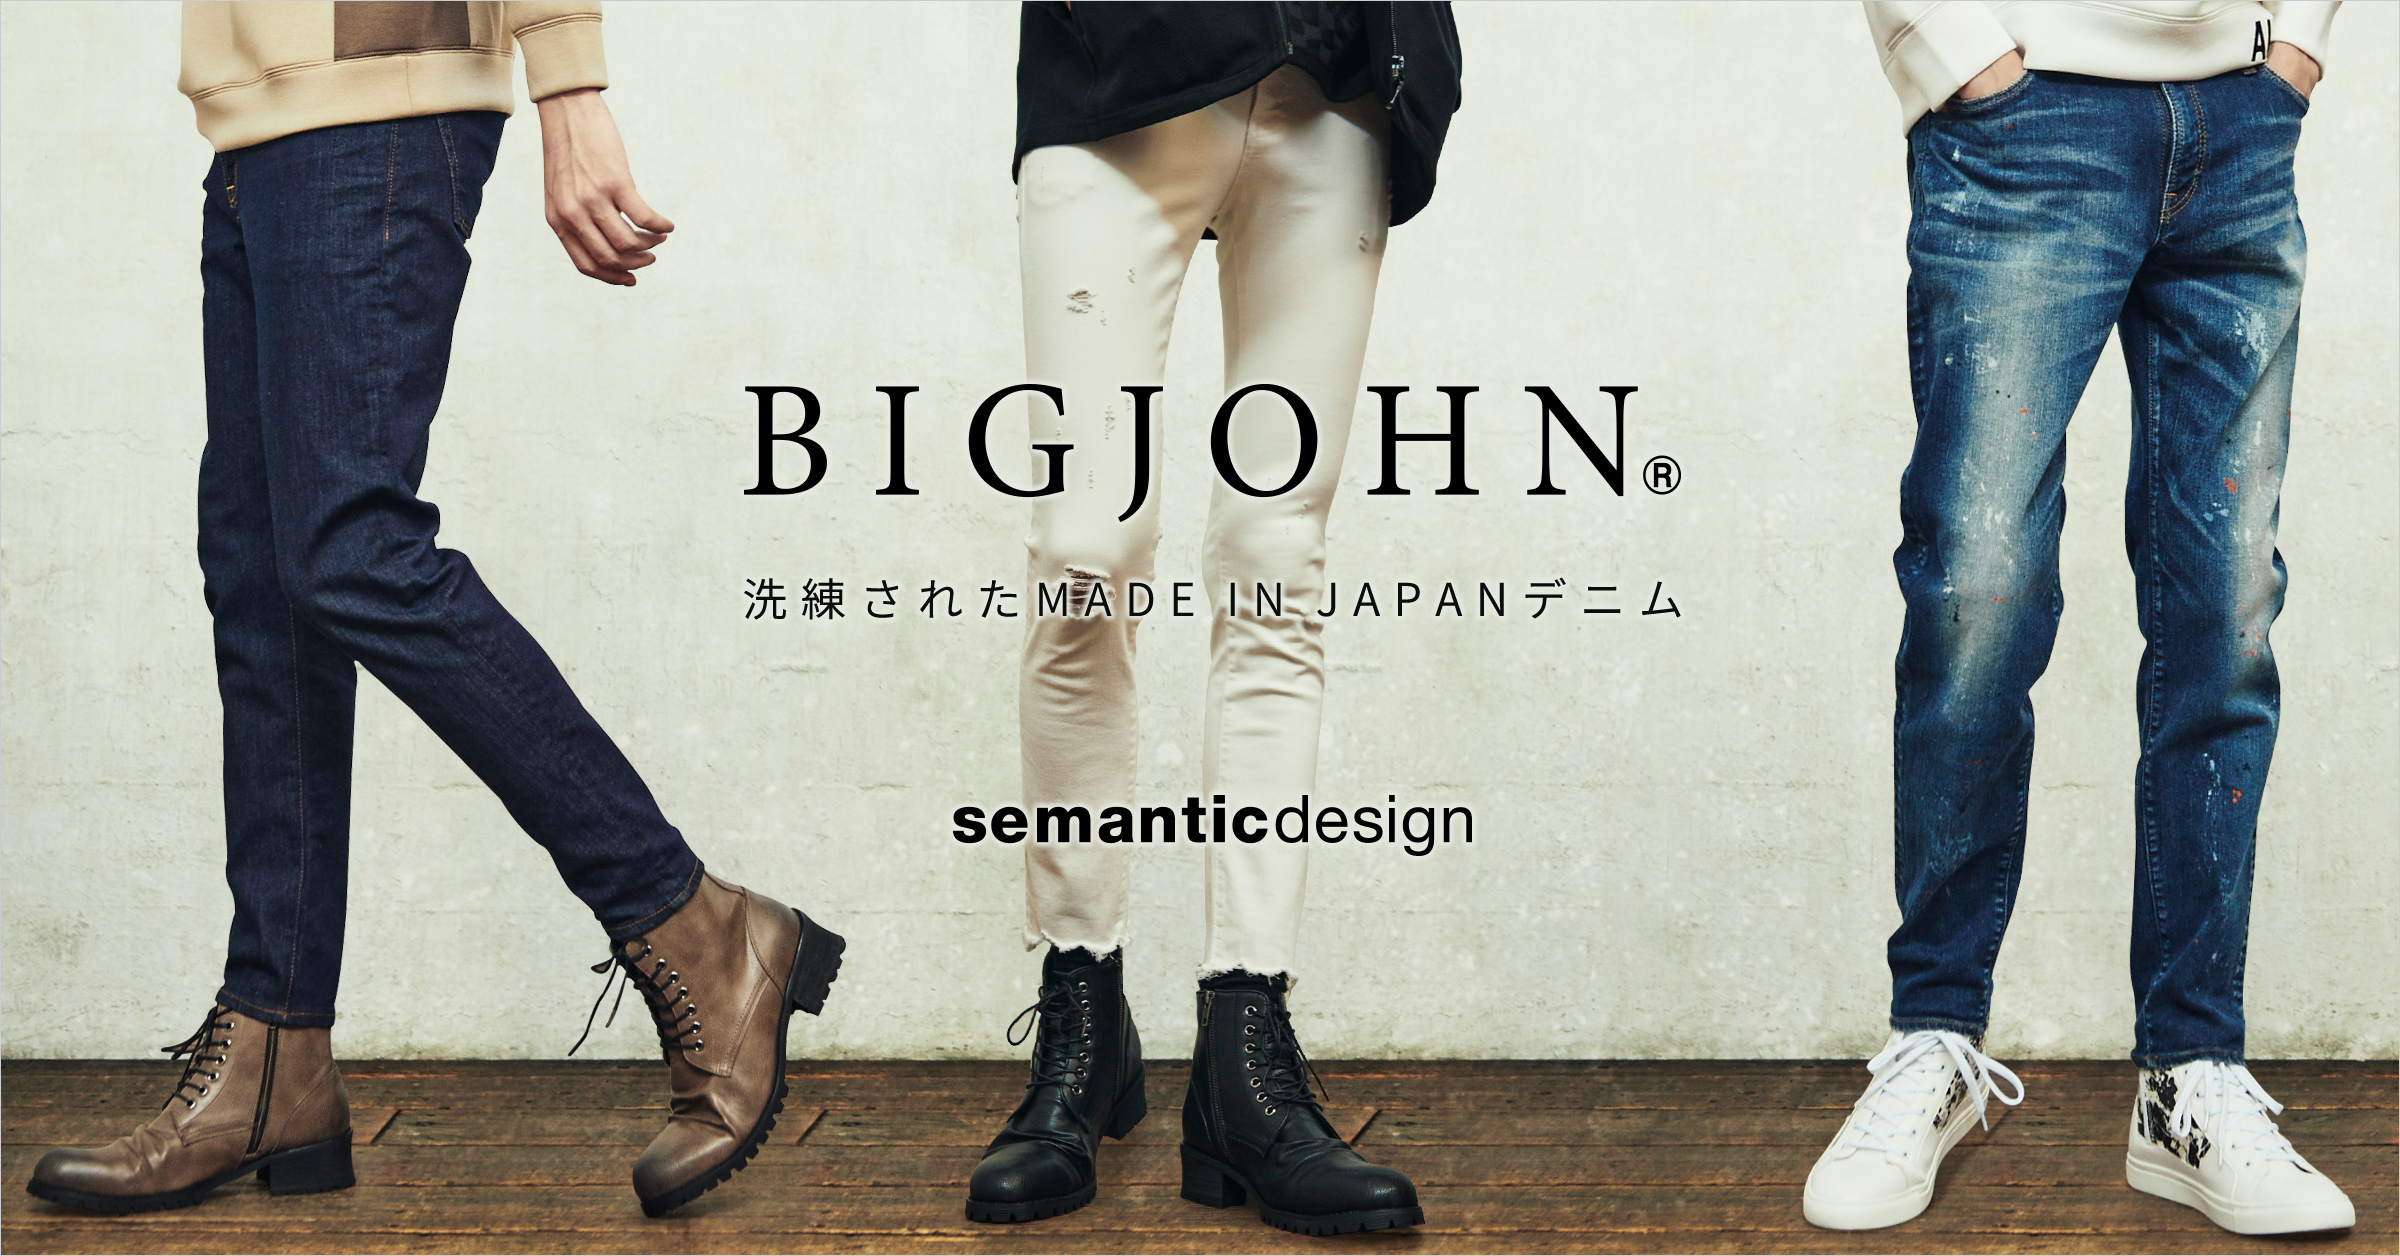 semanticdesign BIGJOHN(セマンティックデザイン ビッグジョン)